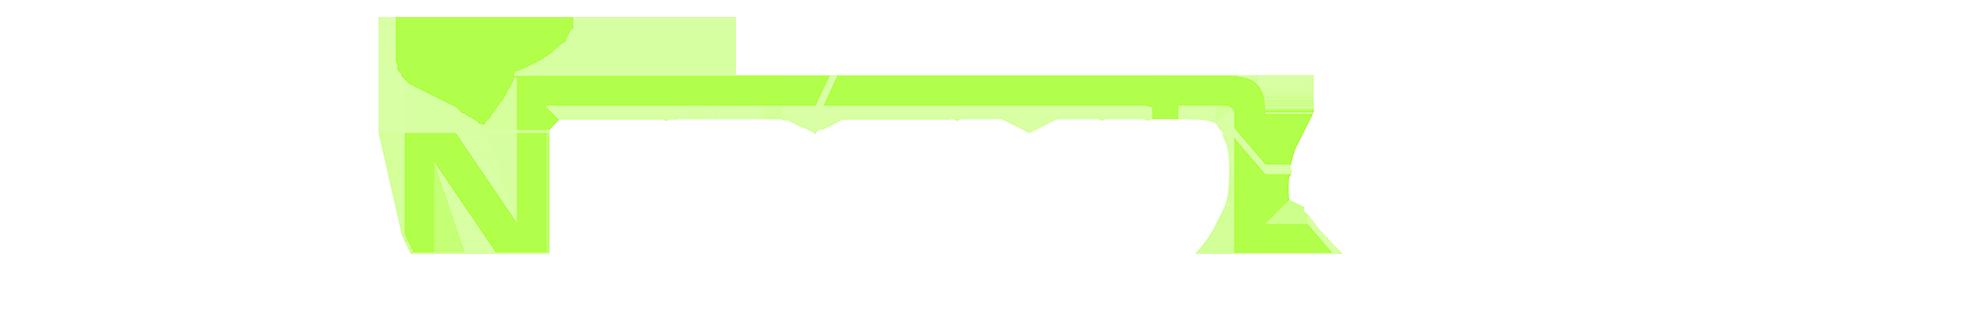 union-cosmos-planet-explorers-logo-png